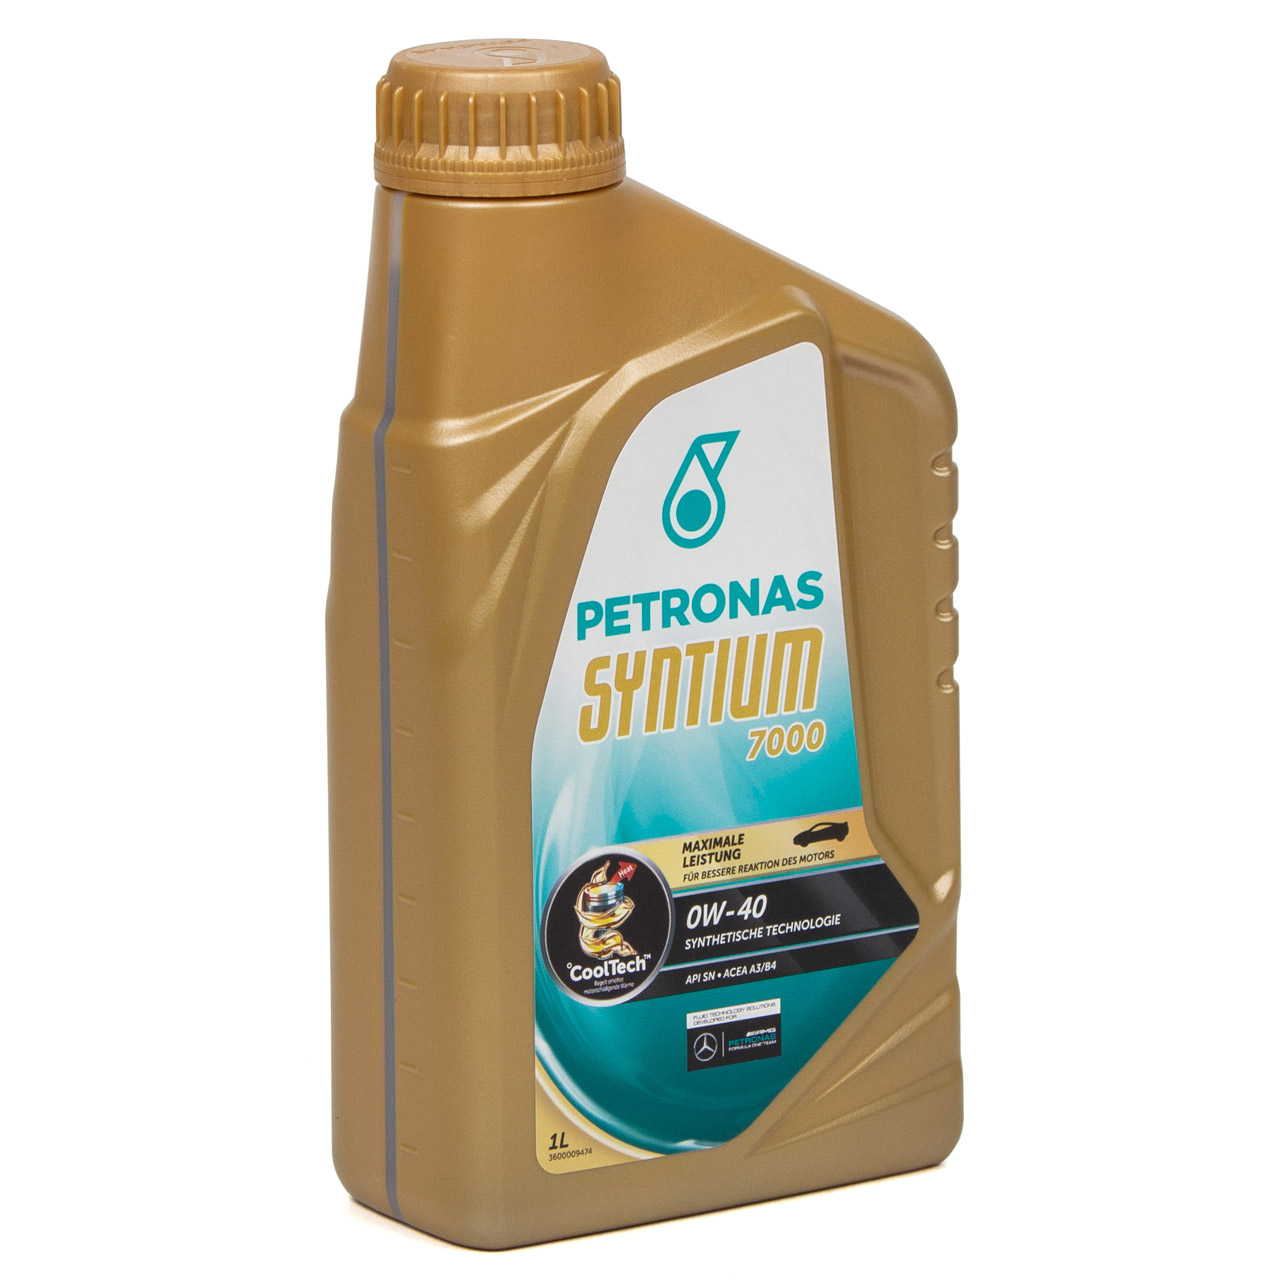 PETRONAS SYNTIUM 7000 Motoröl Öl 0W-40 0W40 MB 229.5 VW 502/505.00 - 1L 1 Liter